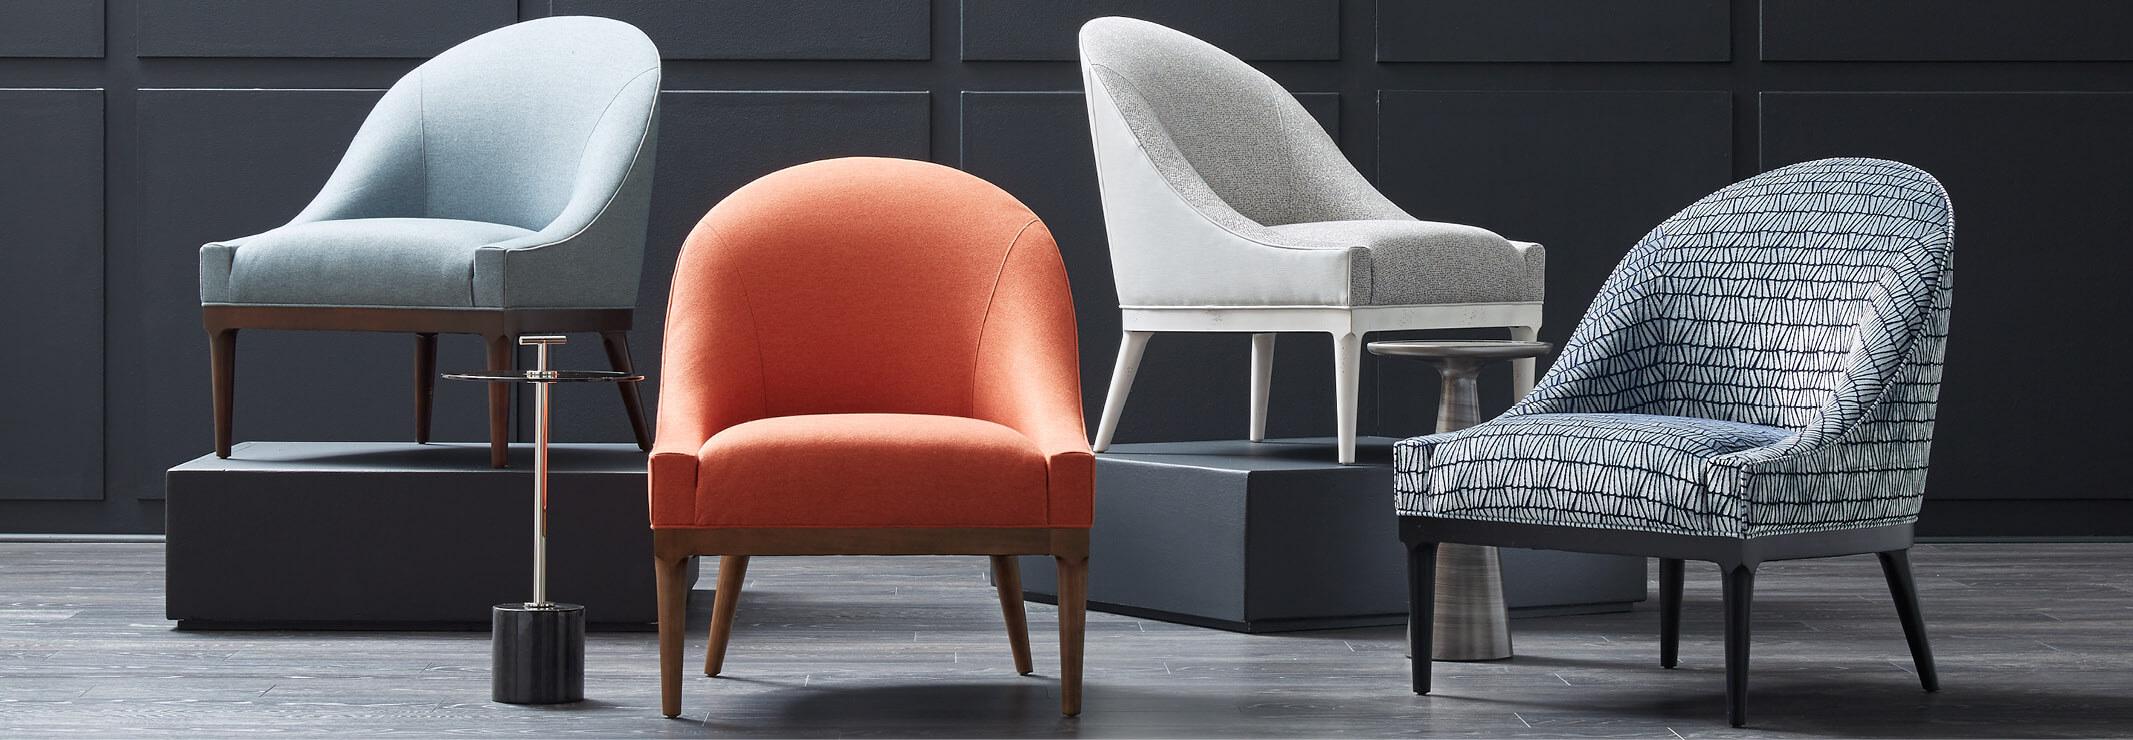 Bella Chairs Assortment